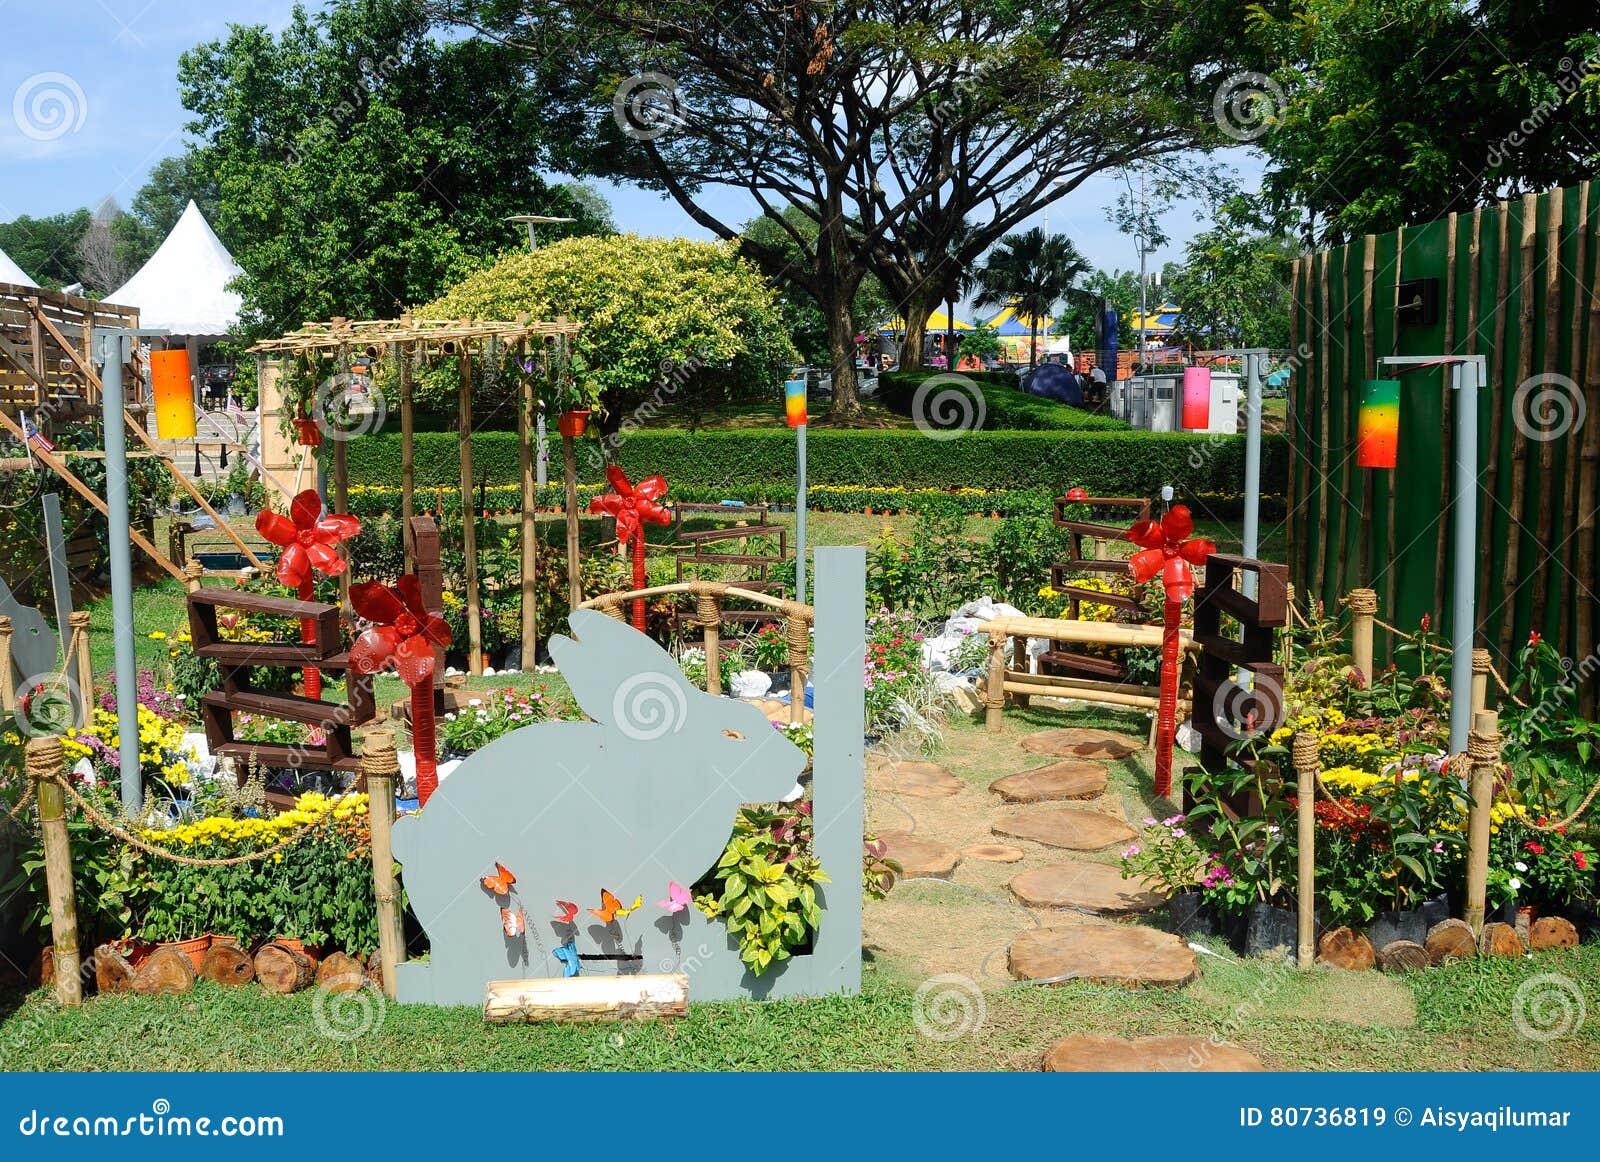 Mini garden built using recycled materials editorial stock for Using recycled materials in the garden